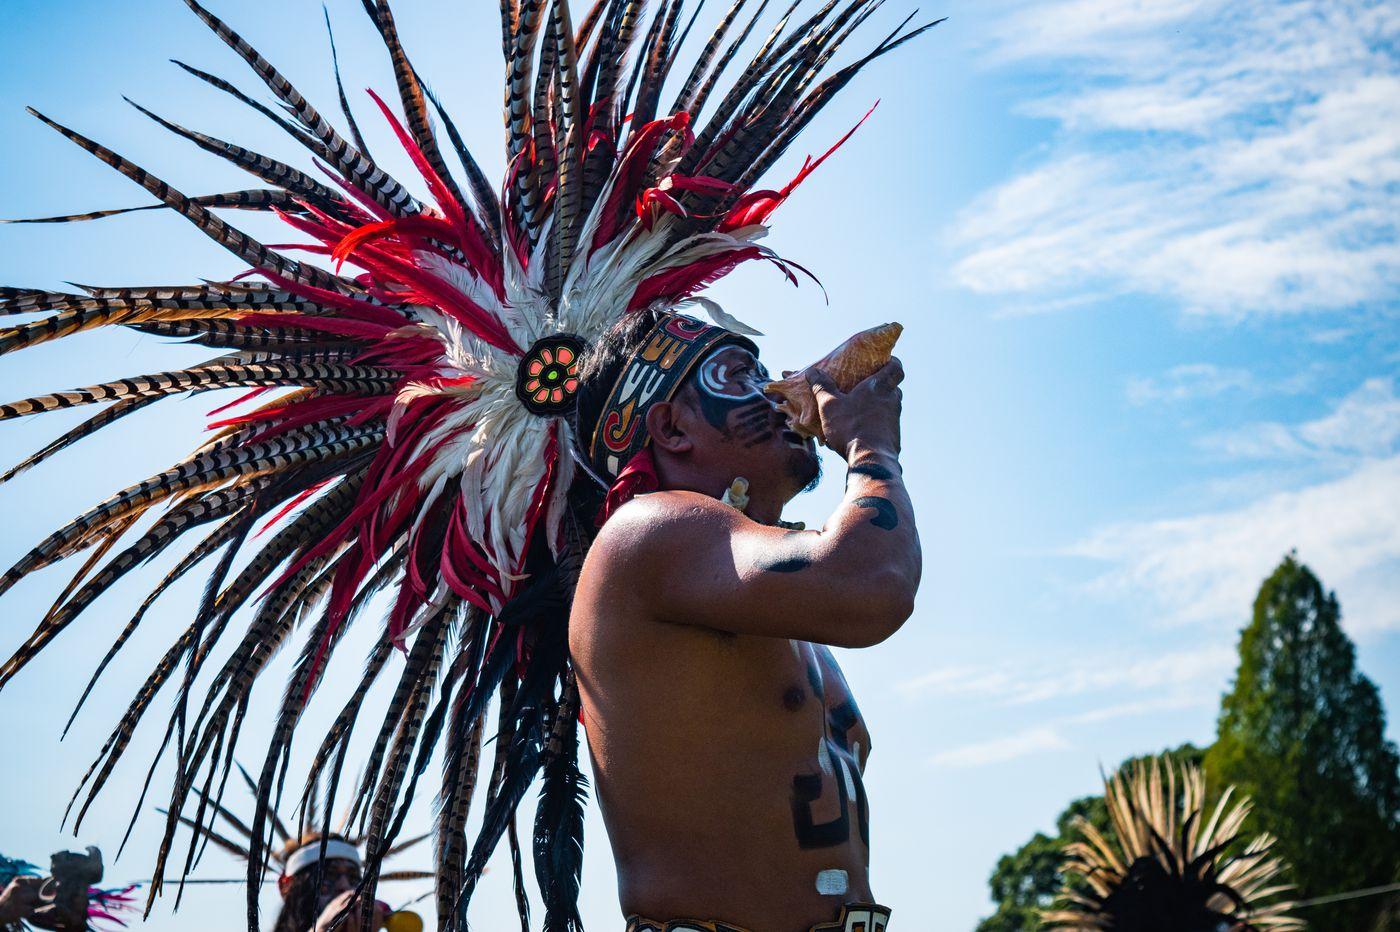 Traditional Aztec dance honors the great fallen 'Charter Oak' at Methacton Mennonite Church